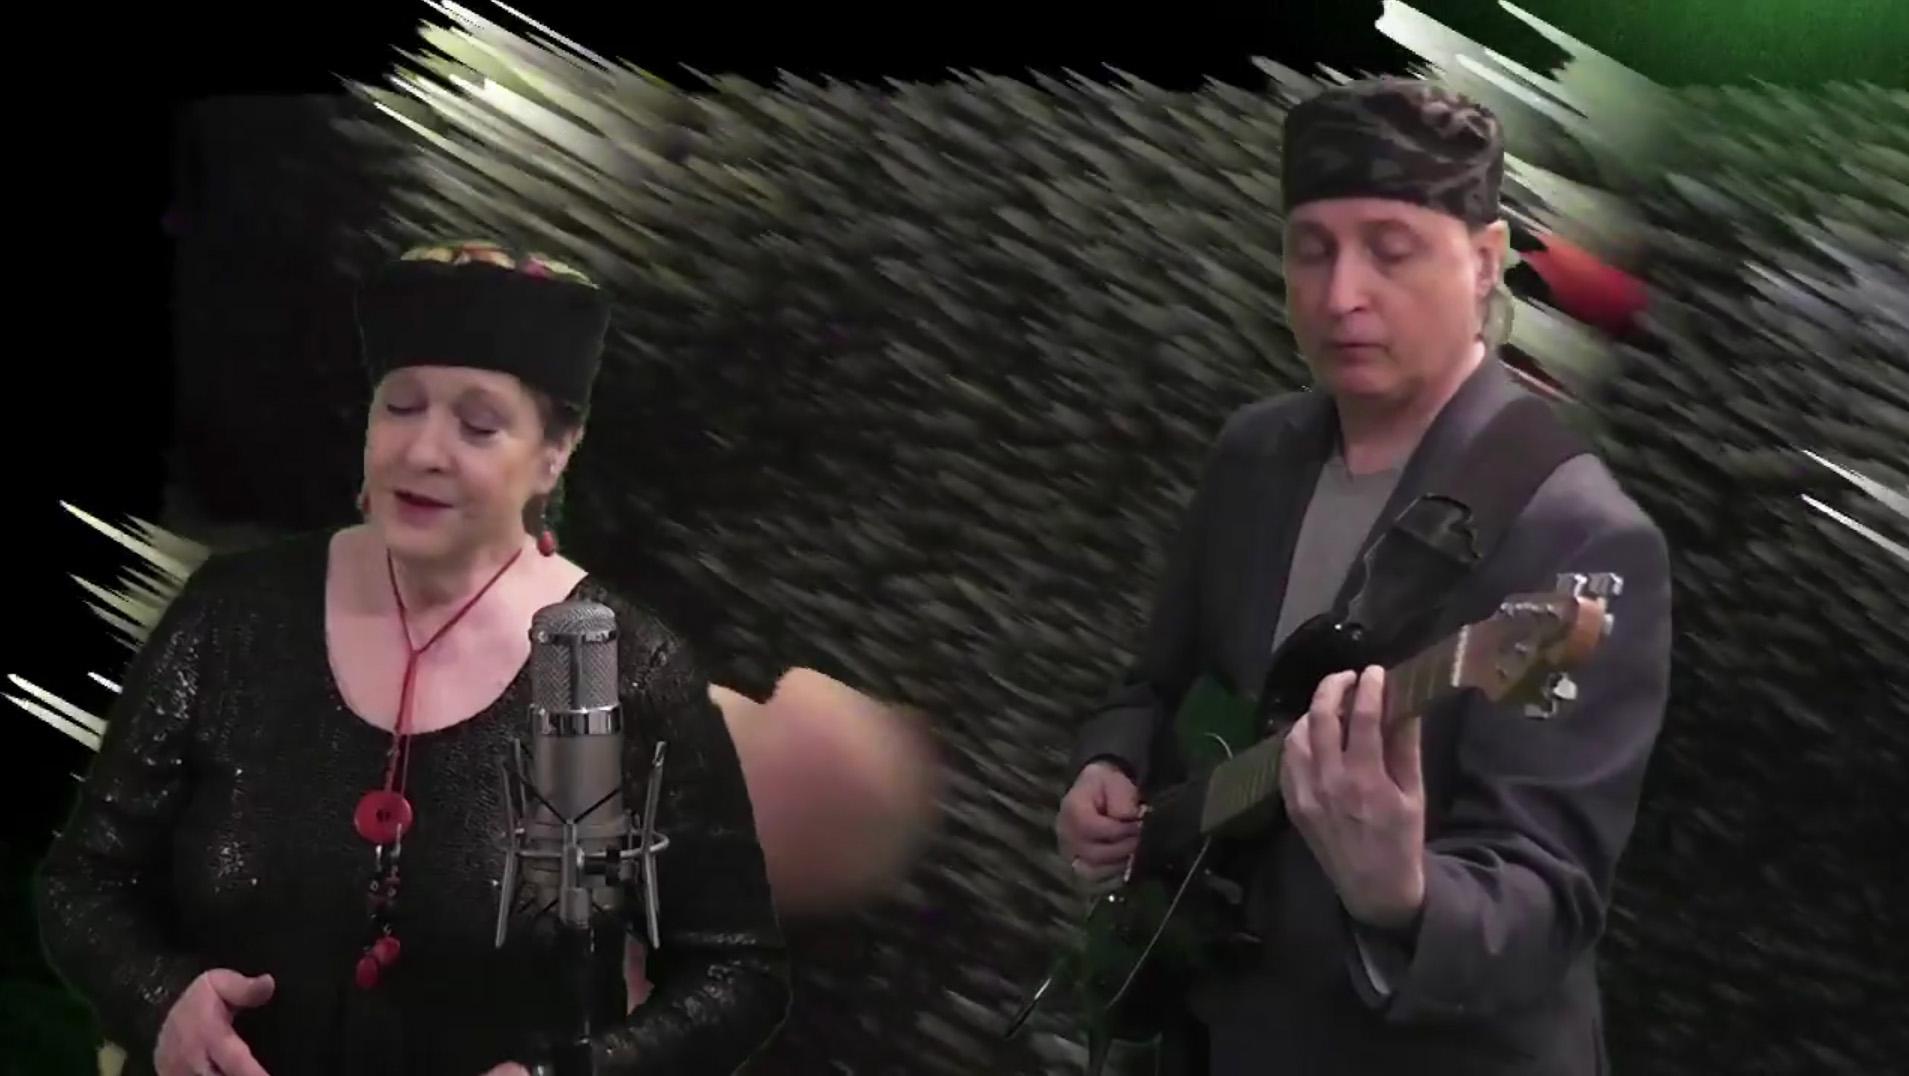 Sonic-Twist®-Judi-Silvano-Bruce-Arnold-sonic-twist.com sonic twist® videos